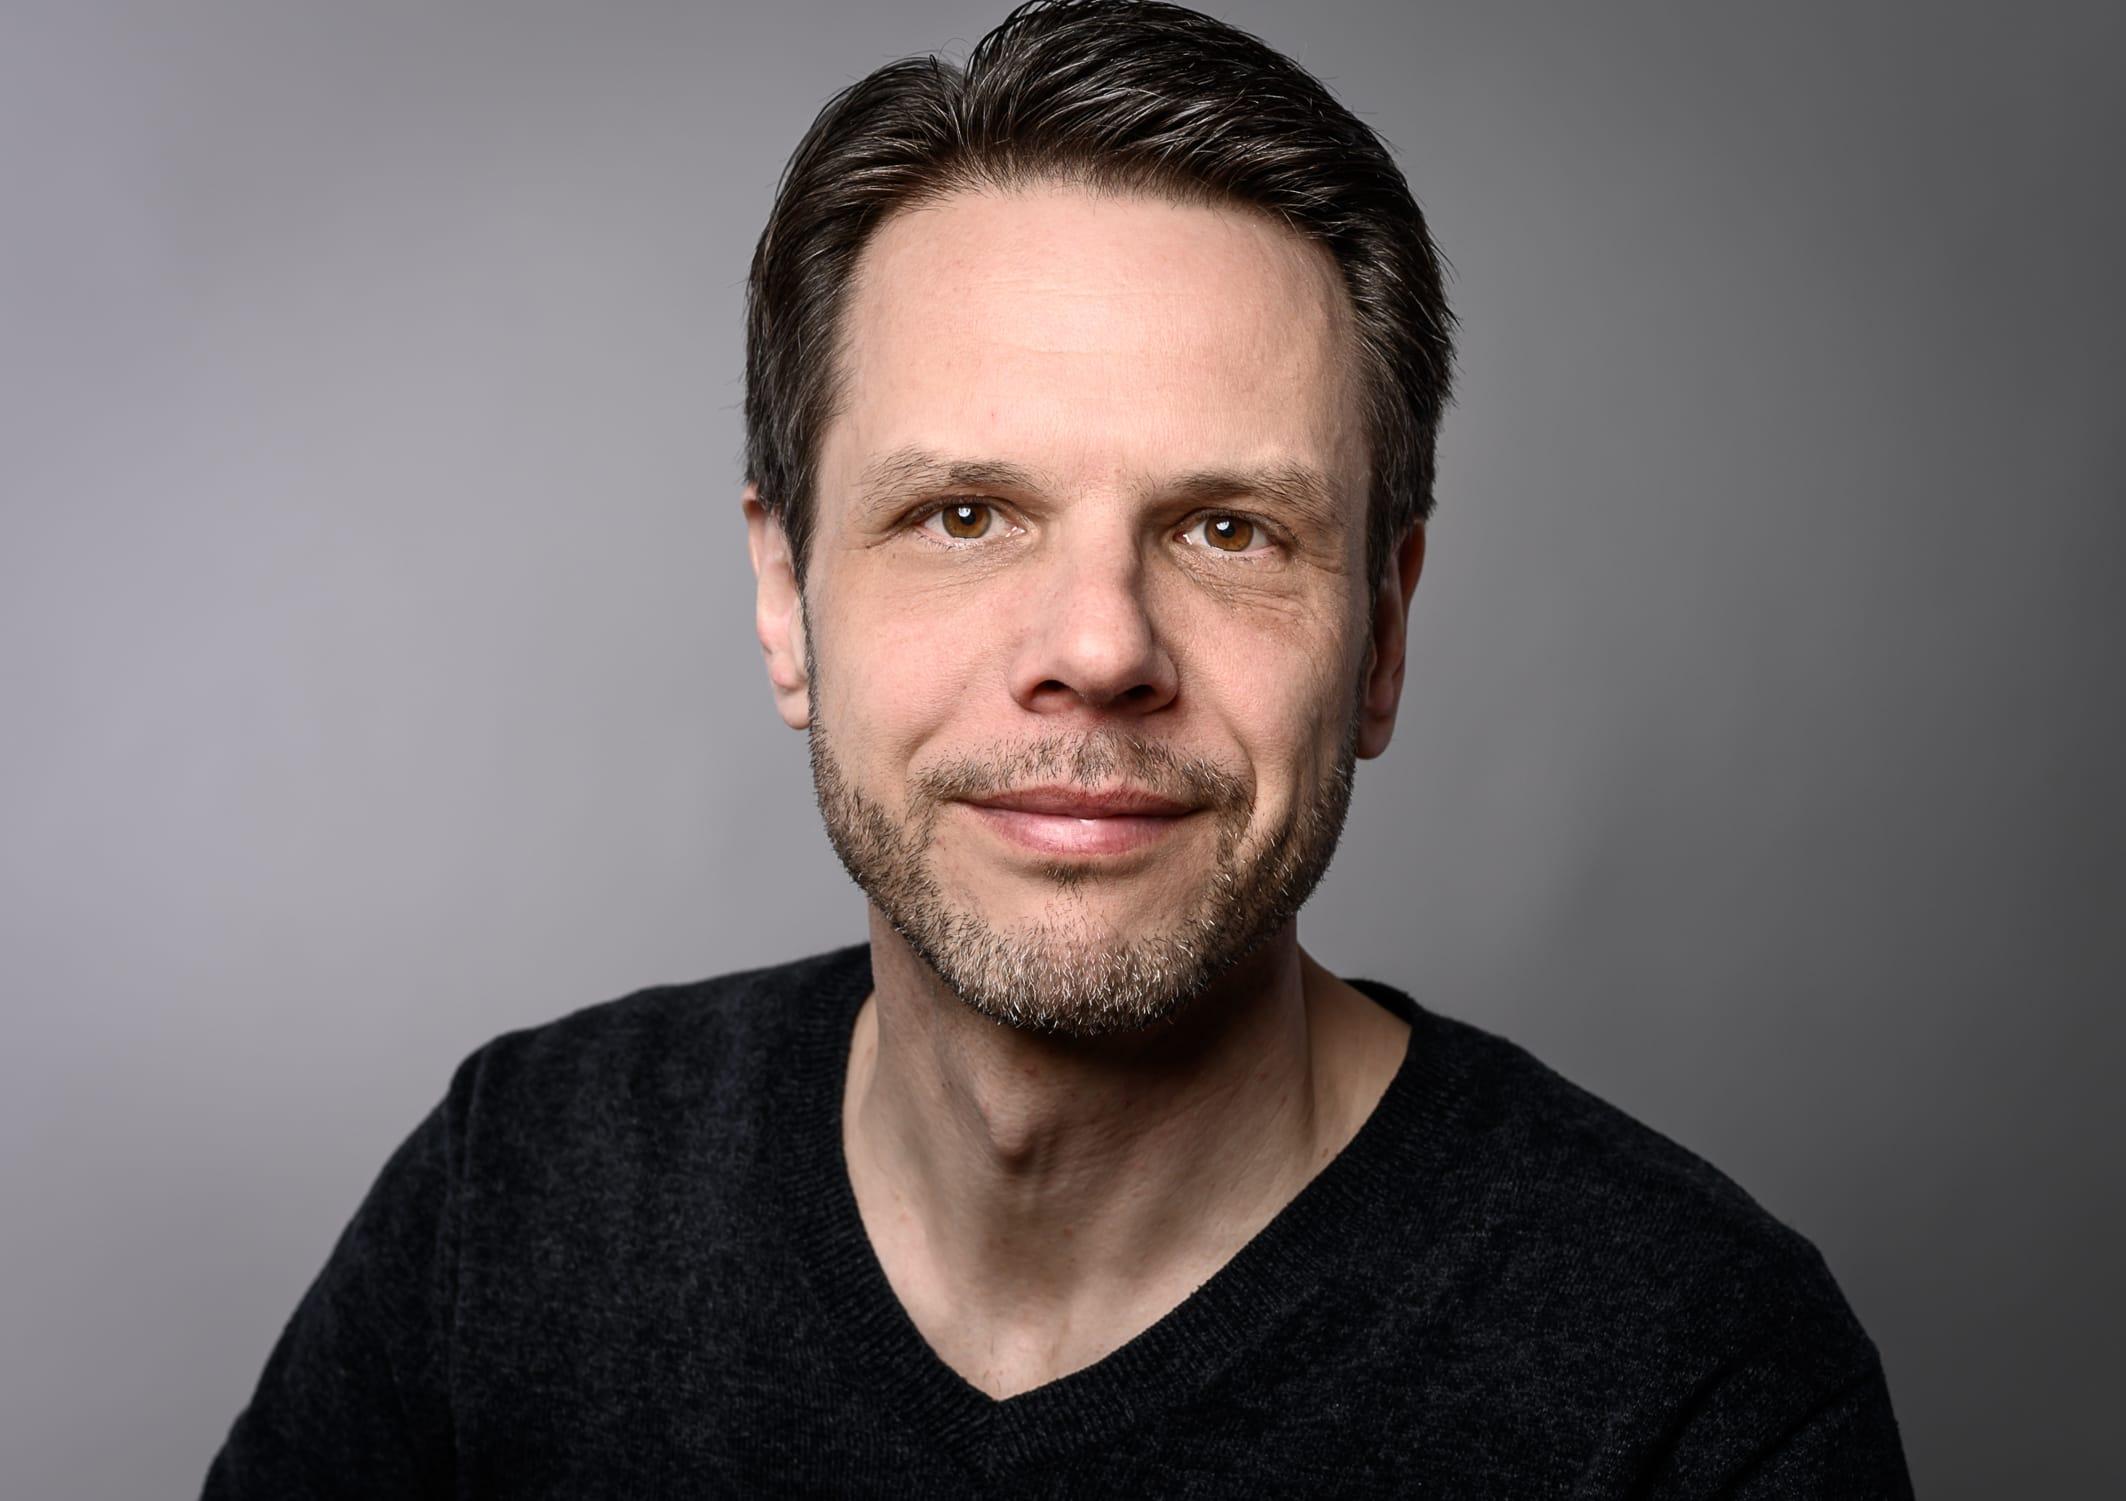 portrait Foto von Andreas Hartig